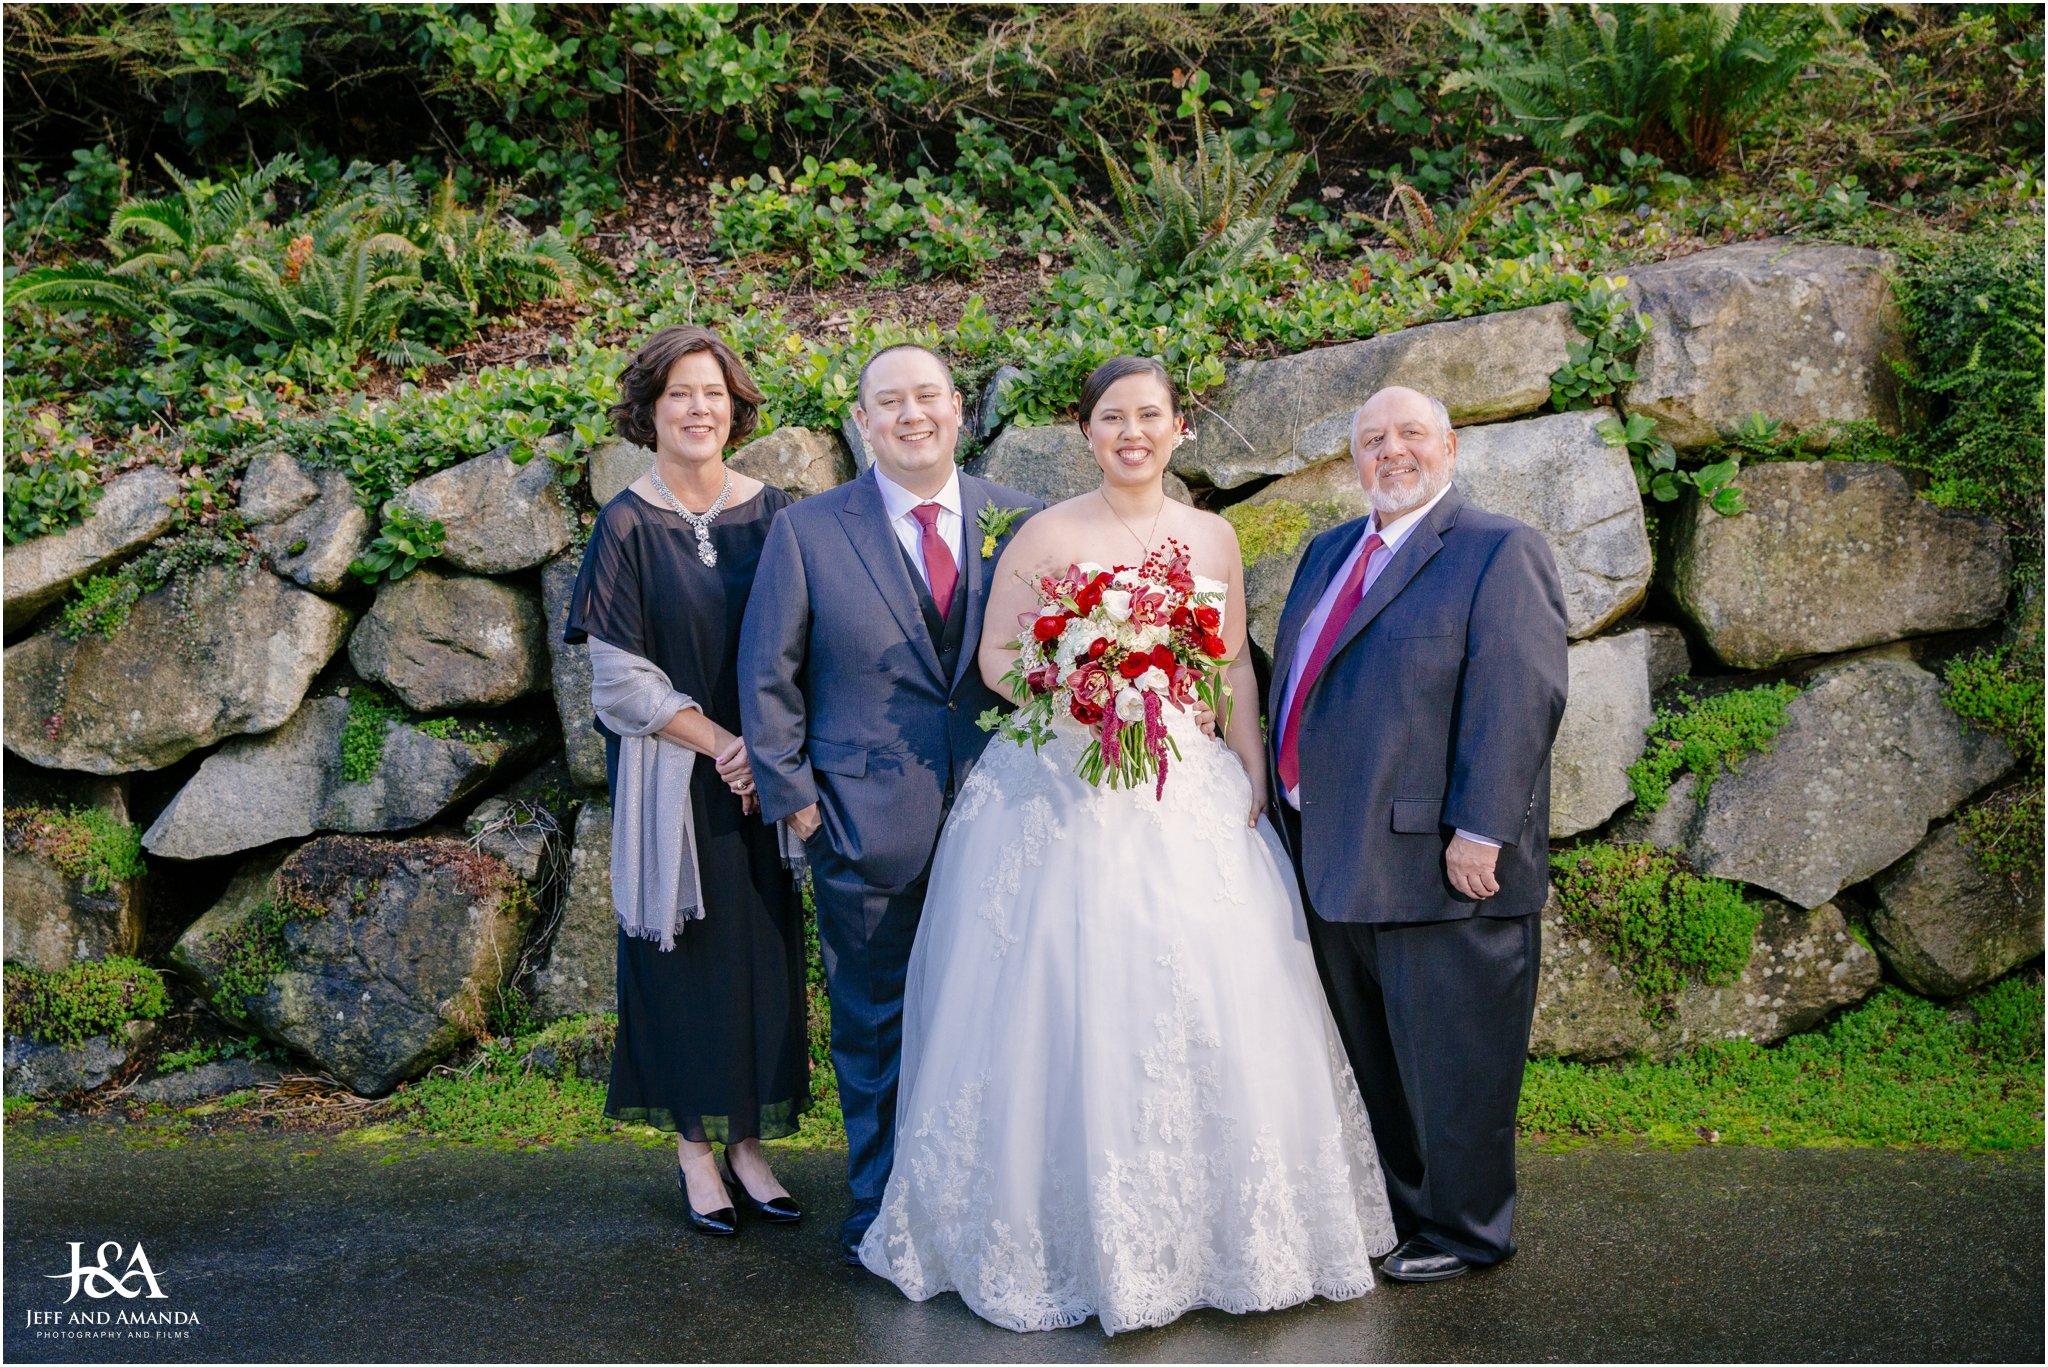 Dave and Kari s Wedding-Facebook Ready-0216.jpg